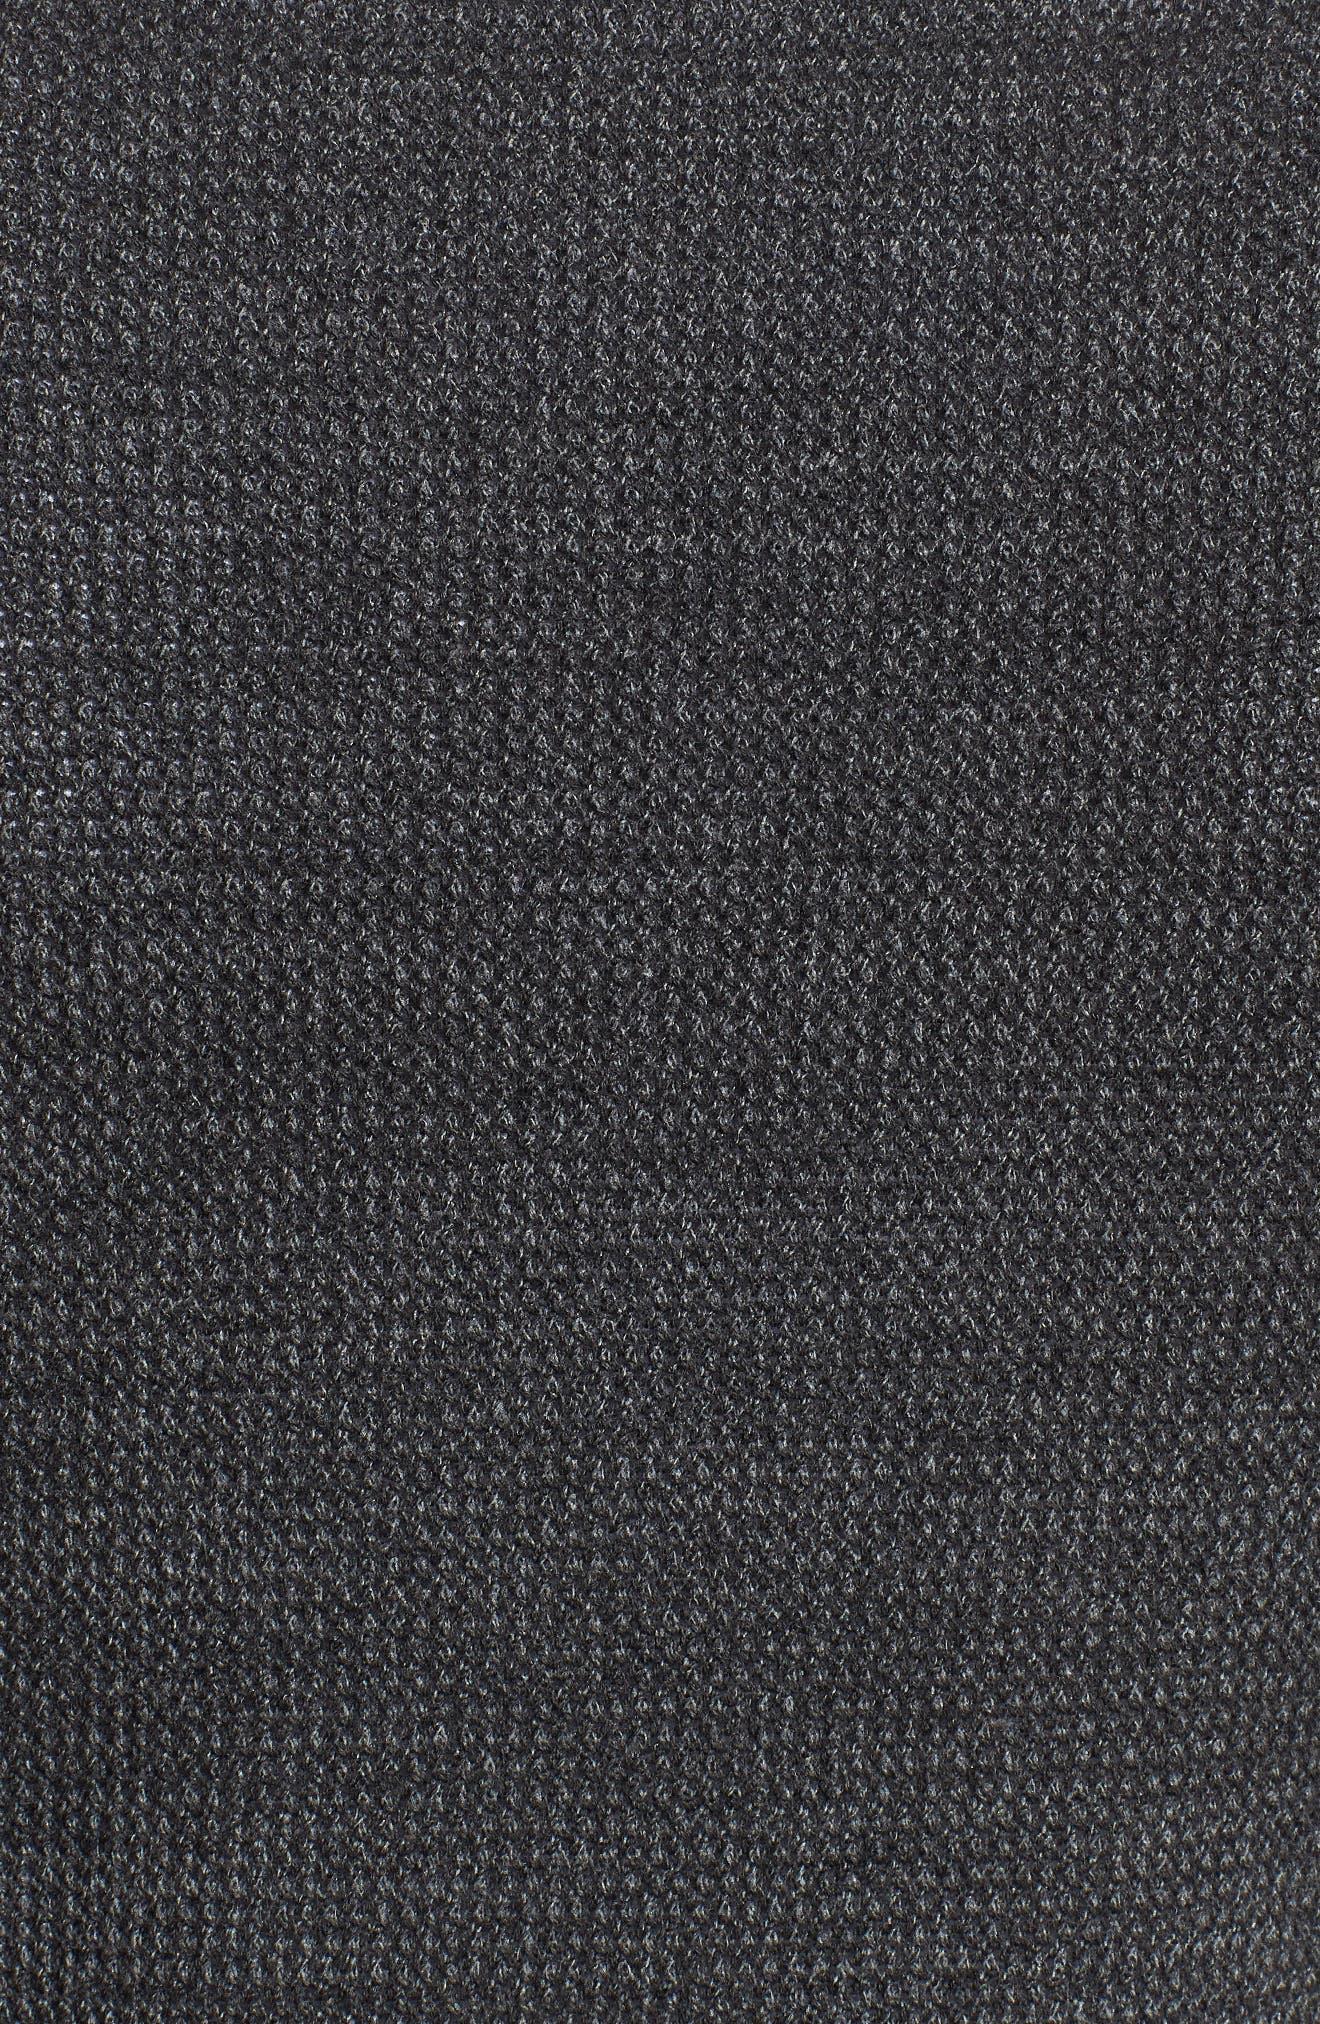 Tech Sweater Baseball Jacket,                             Alternate thumbnail 5, color,                             BLACK OXIDE SPACEDYE